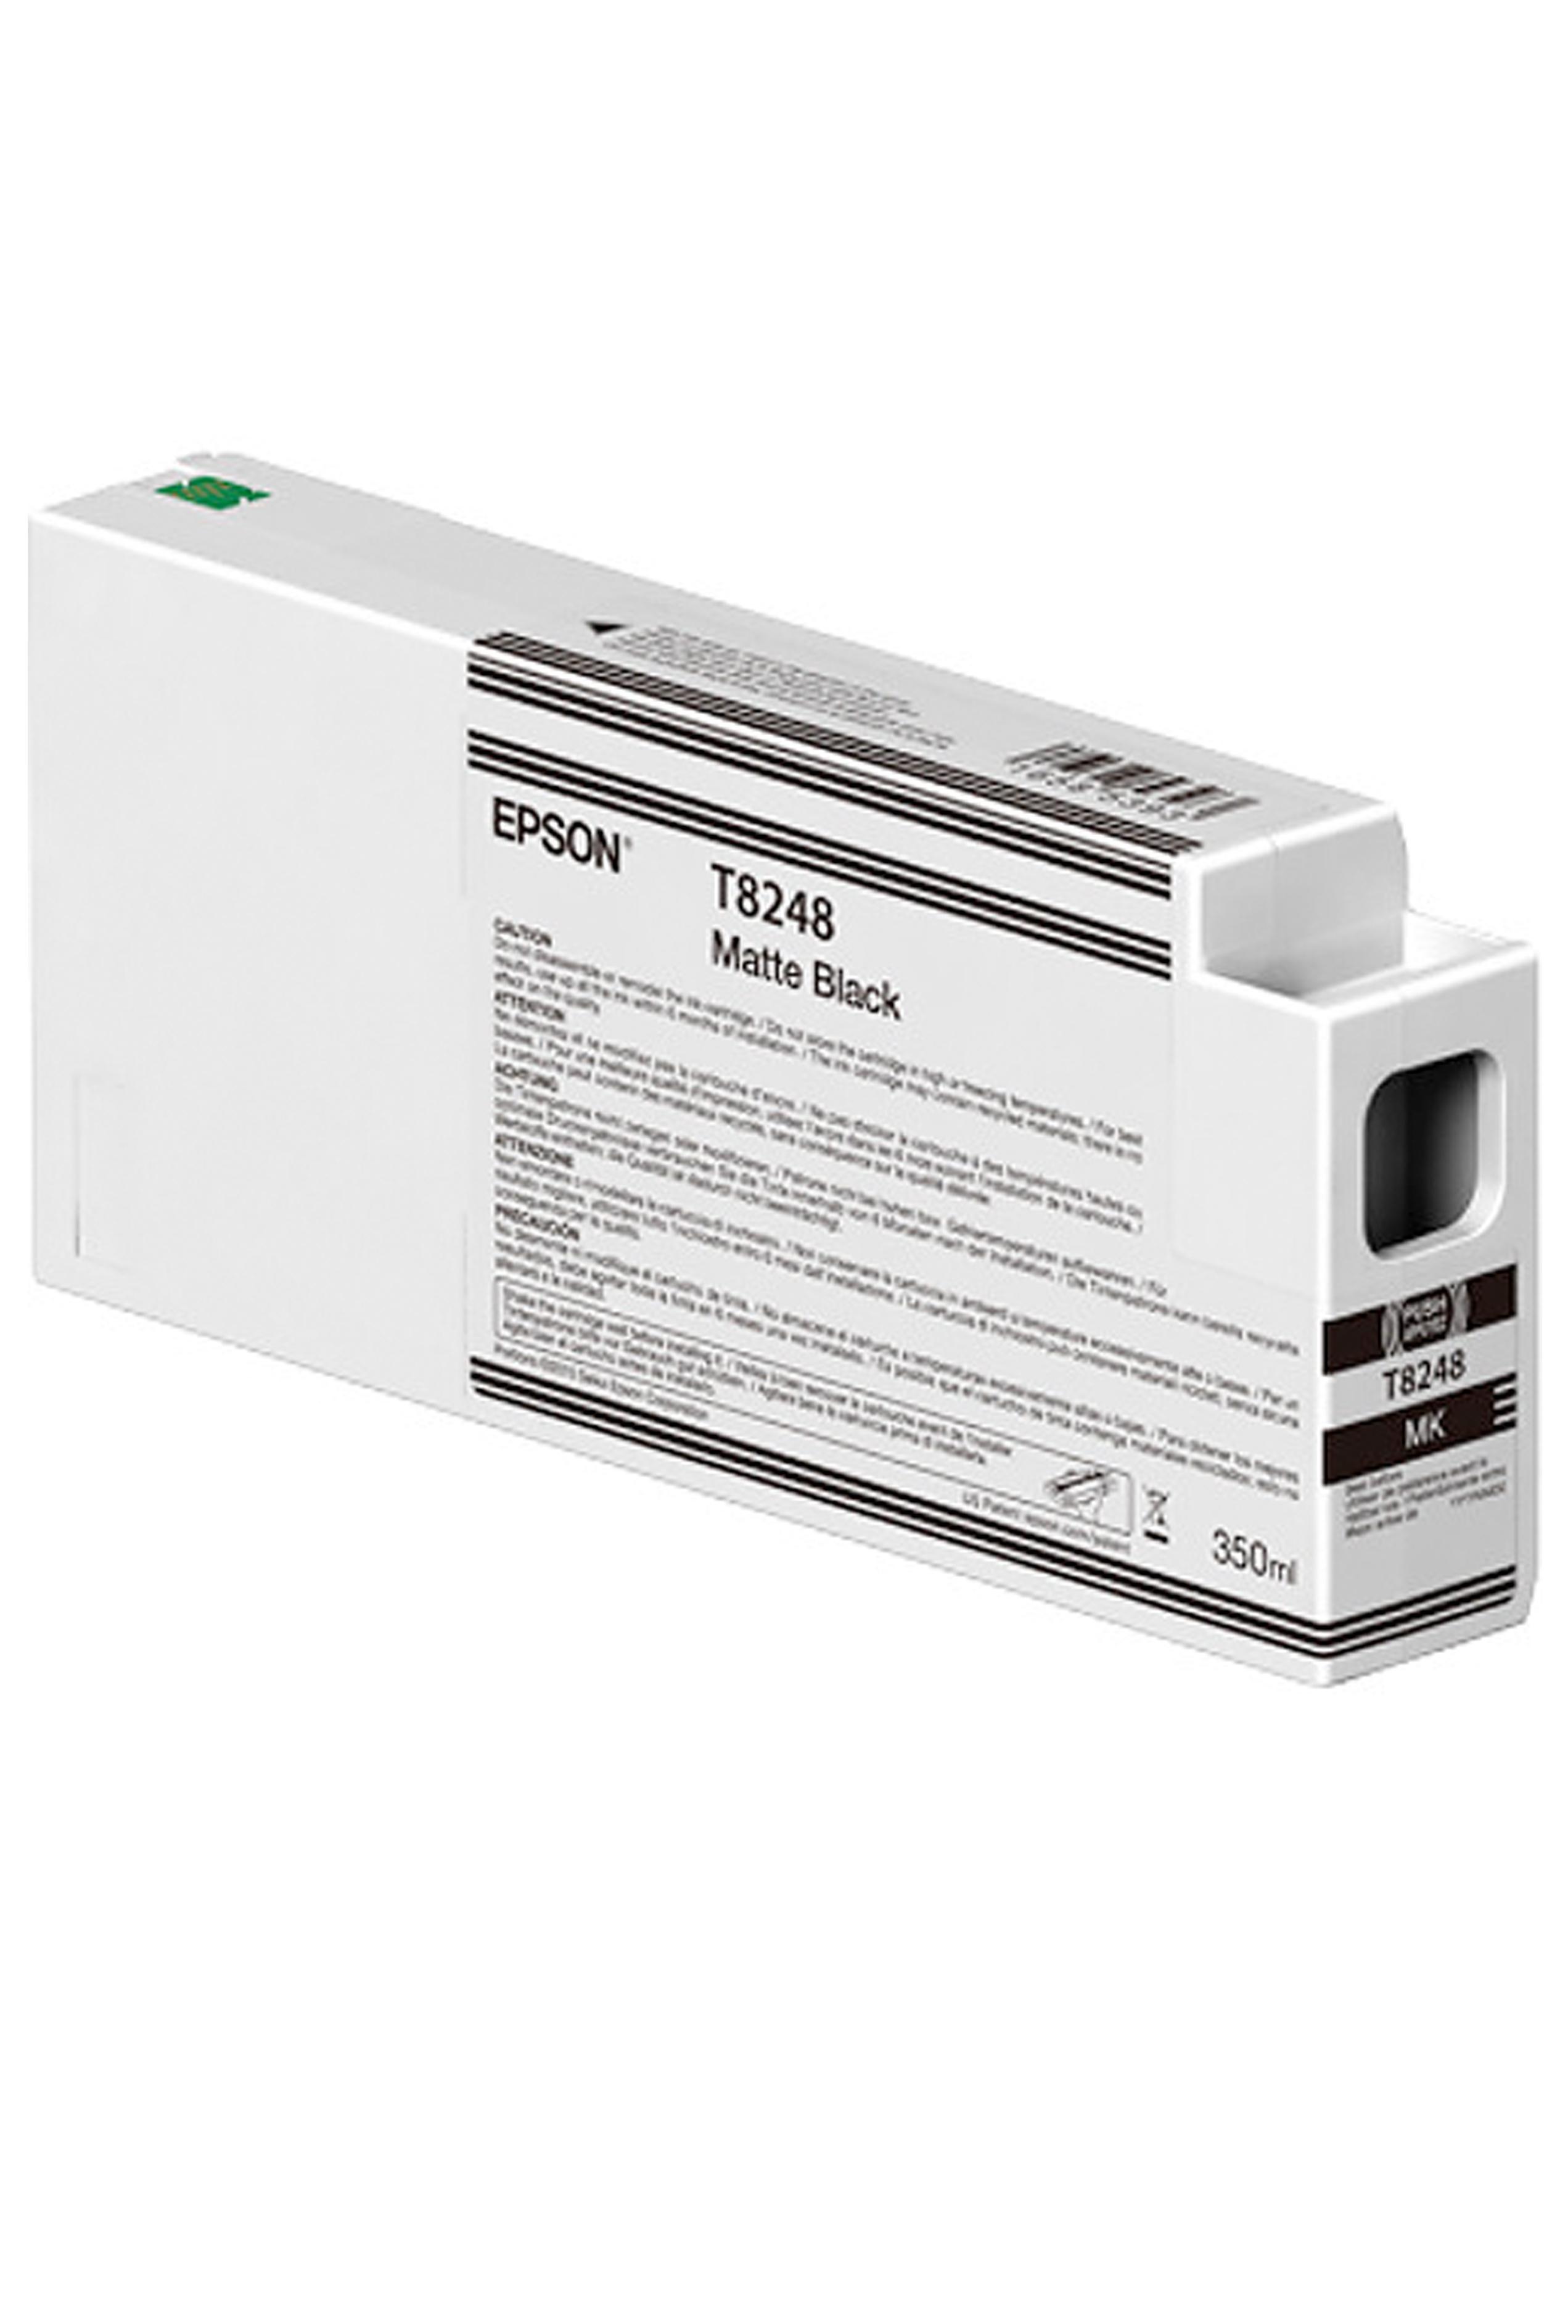 Epson EPSON HI MATTE BLACK INK (350 ML) (T824800)